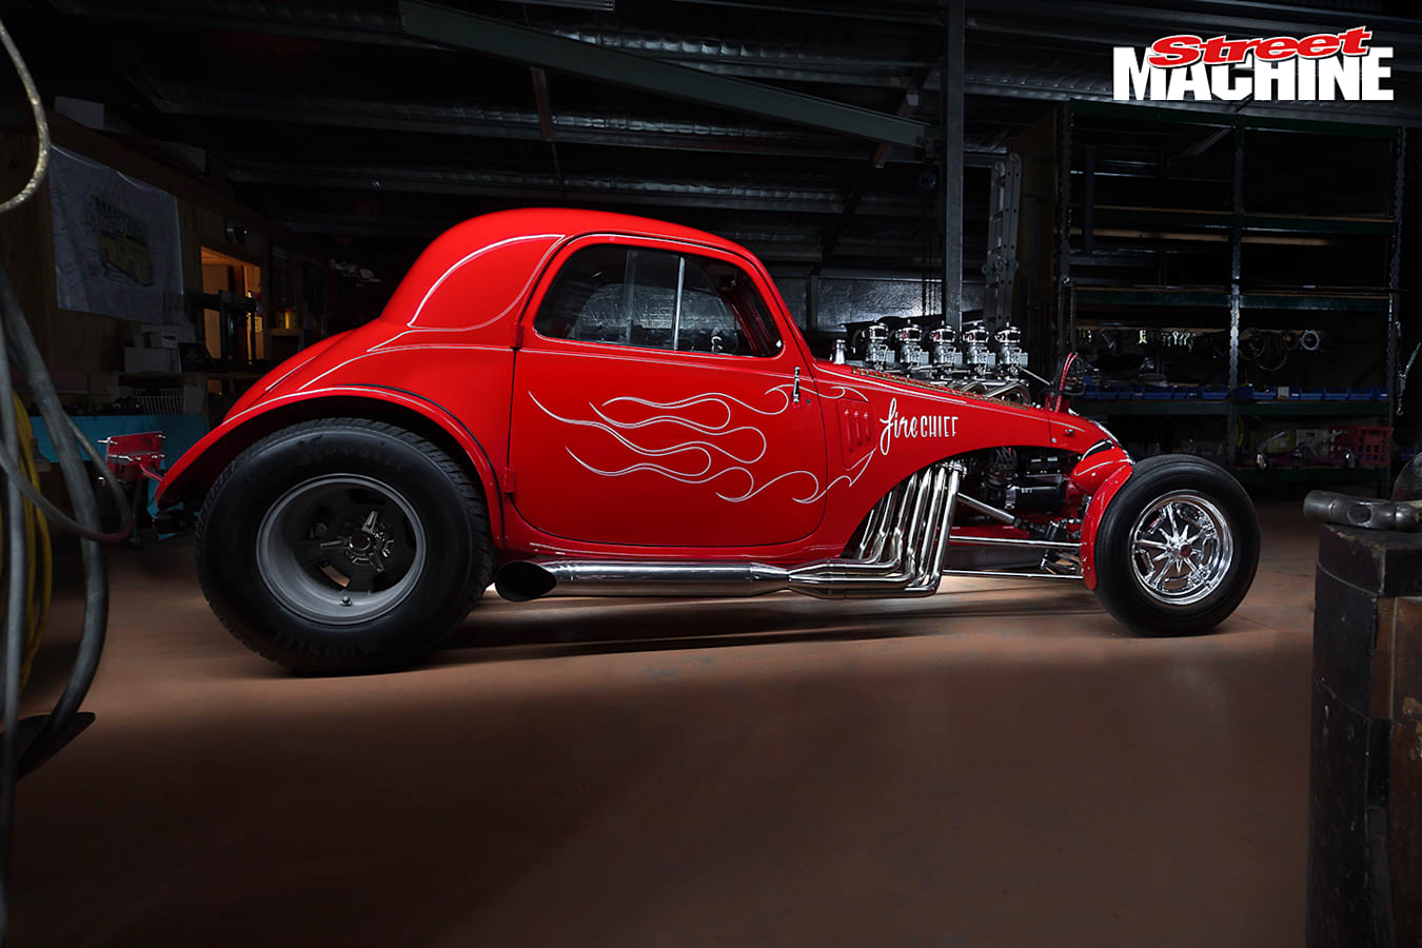 Firechief Fiat Hot Rod 3 Nw Jpg